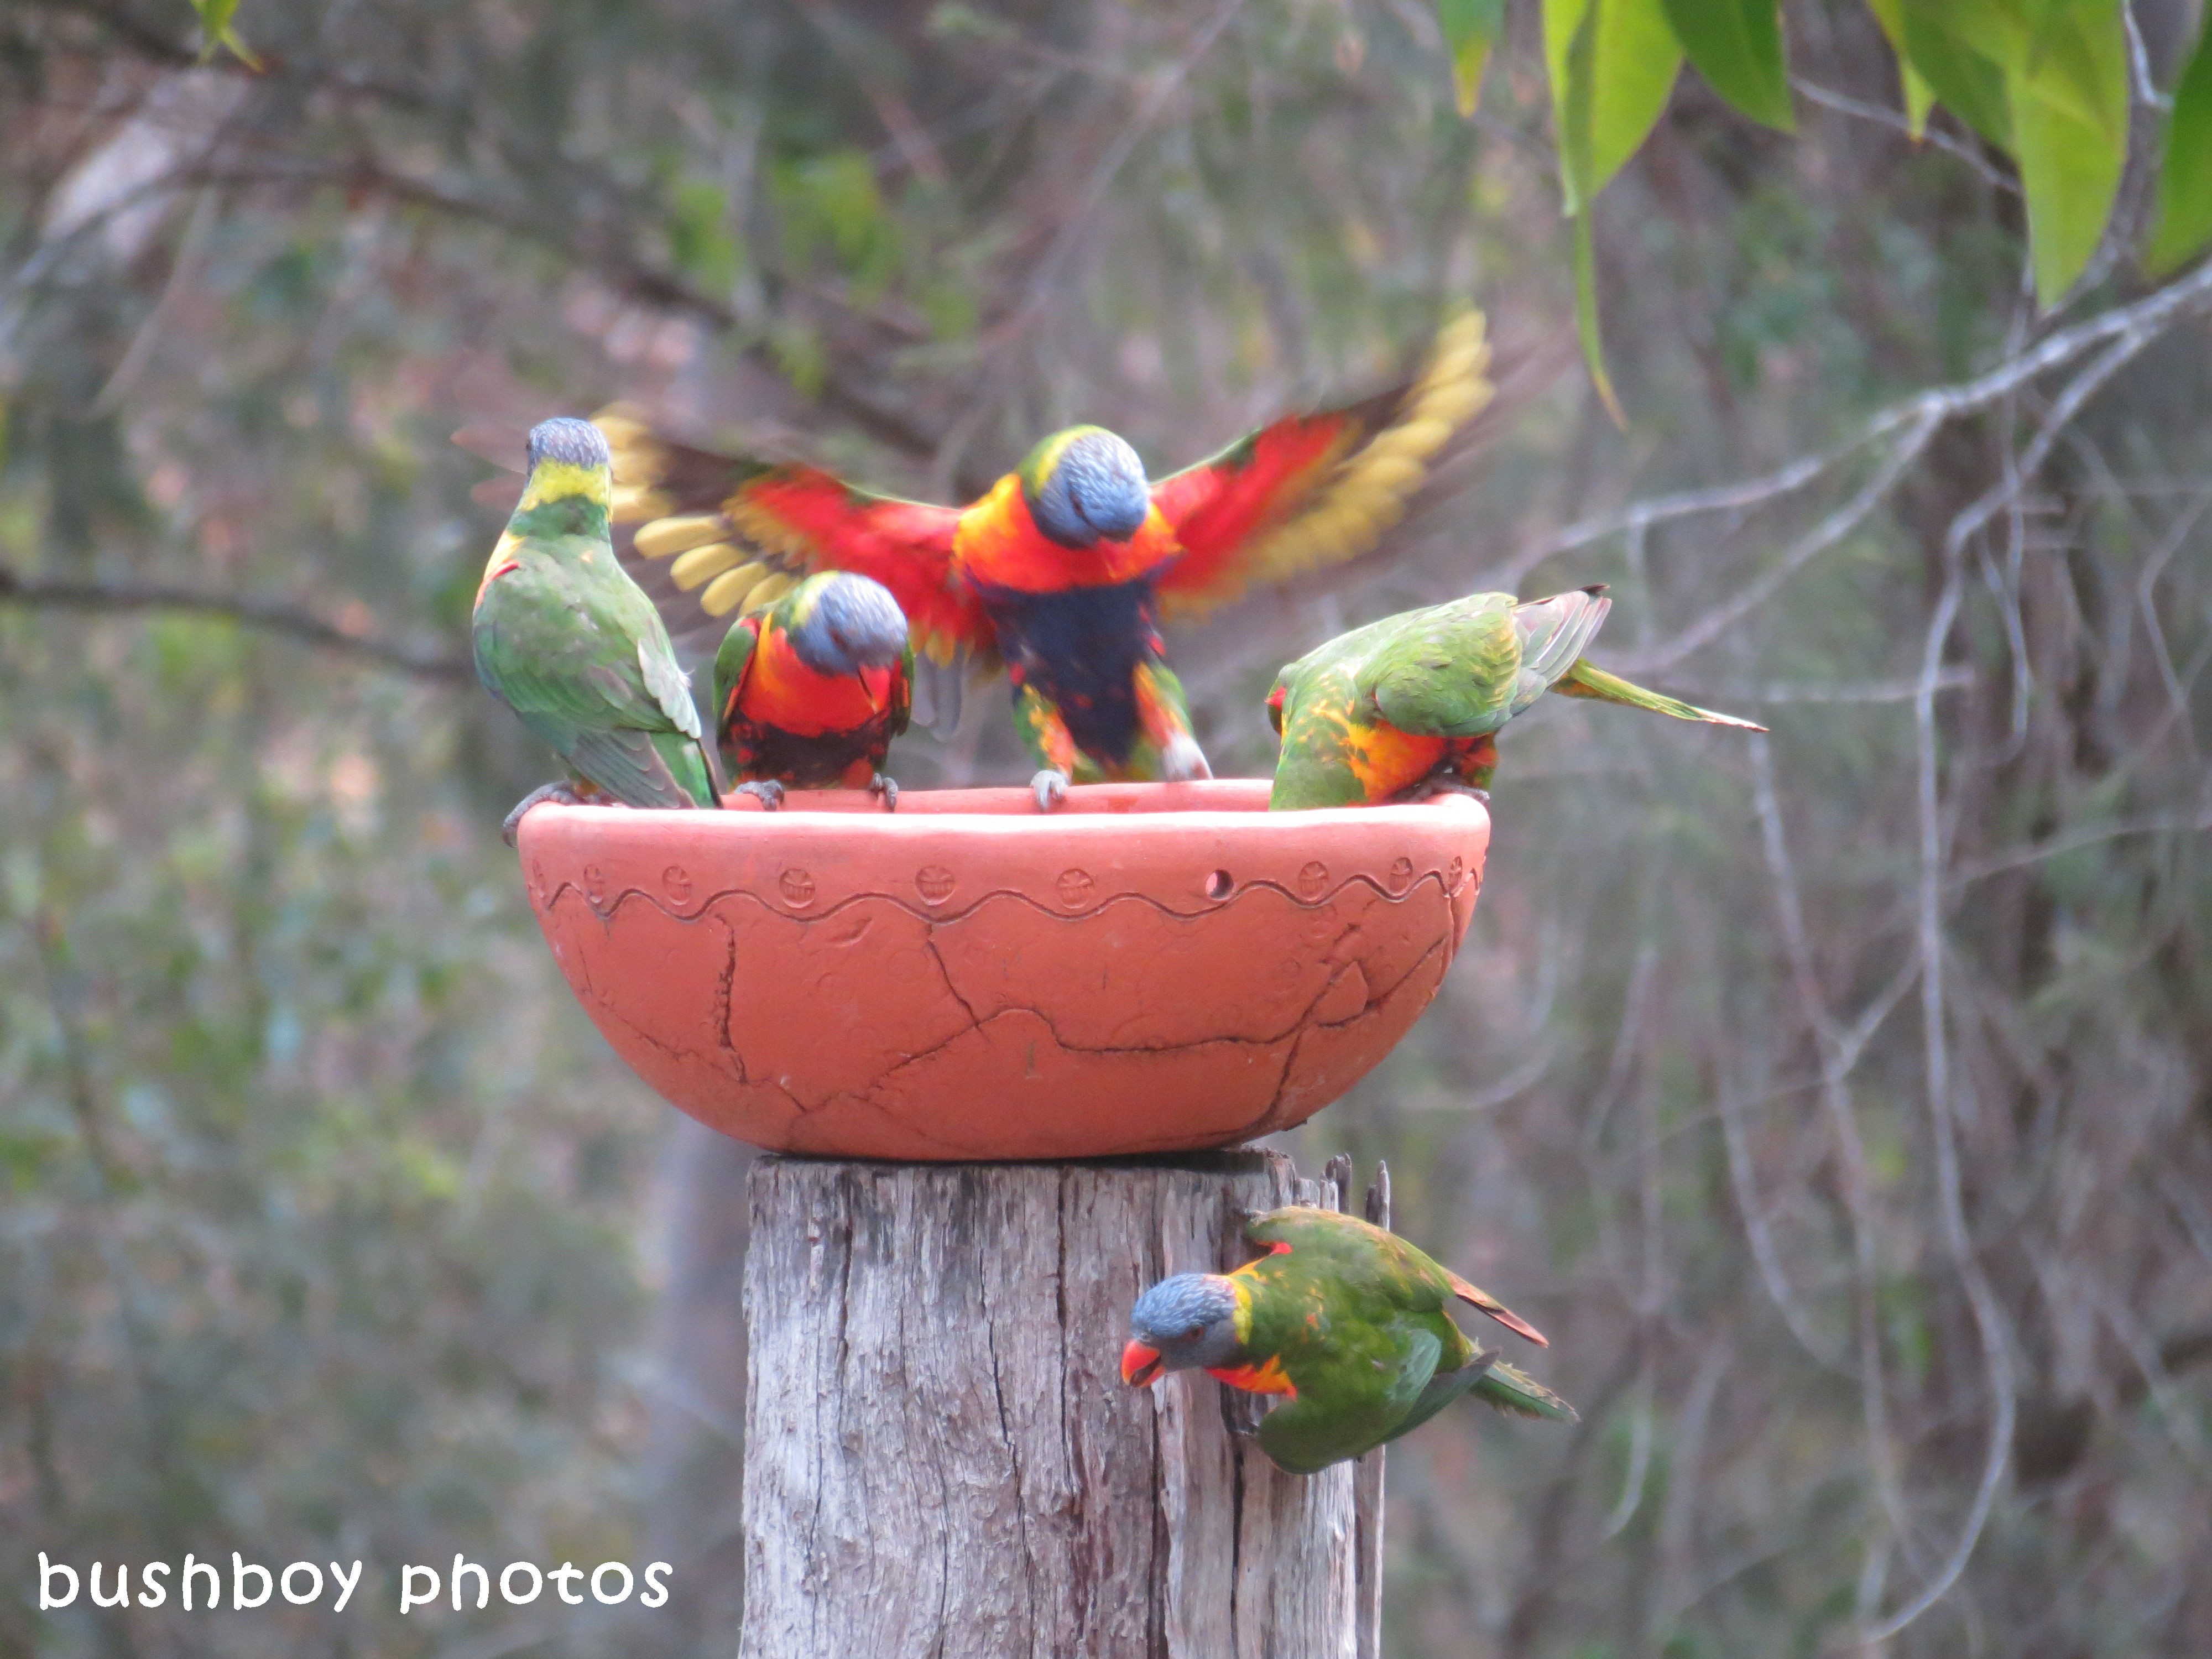 180329_blog challenge_quartet_rainbow lorikeets2